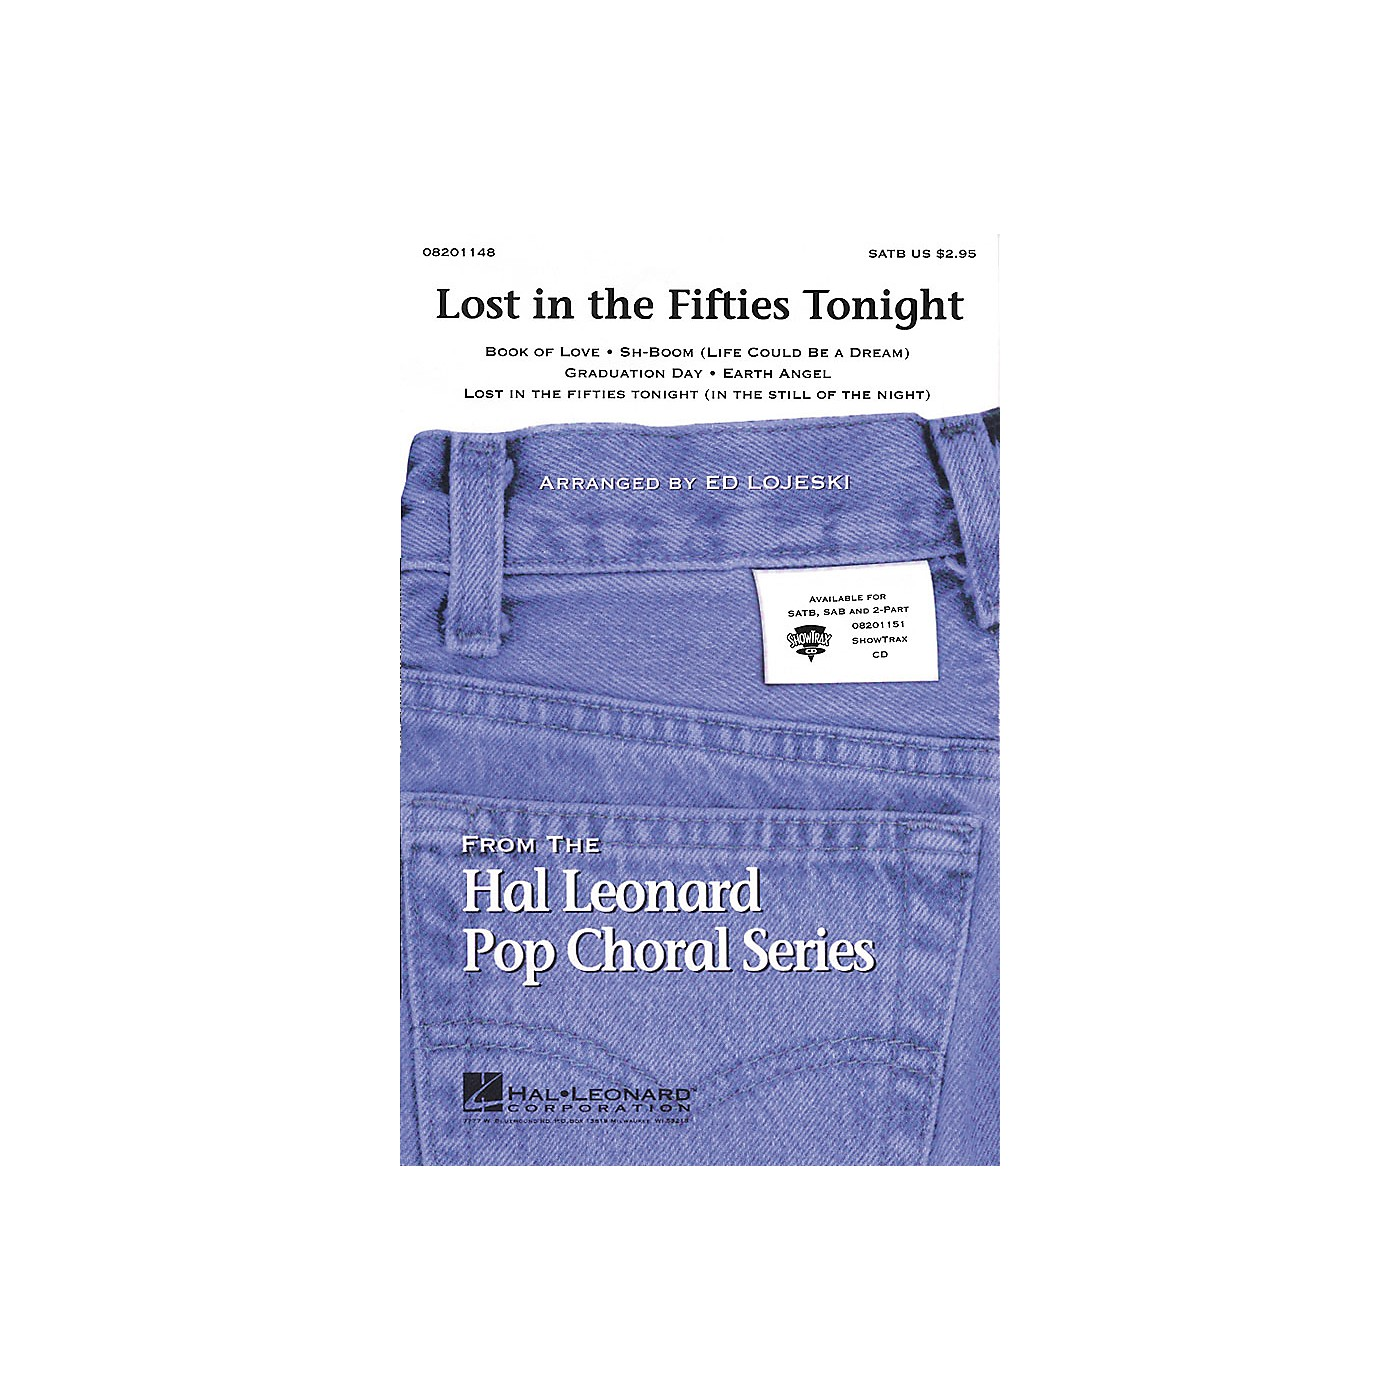 Hal Leonard Lost in the Fifties Tonight (Medley) SATB arranged by Ed Lojeski thumbnail